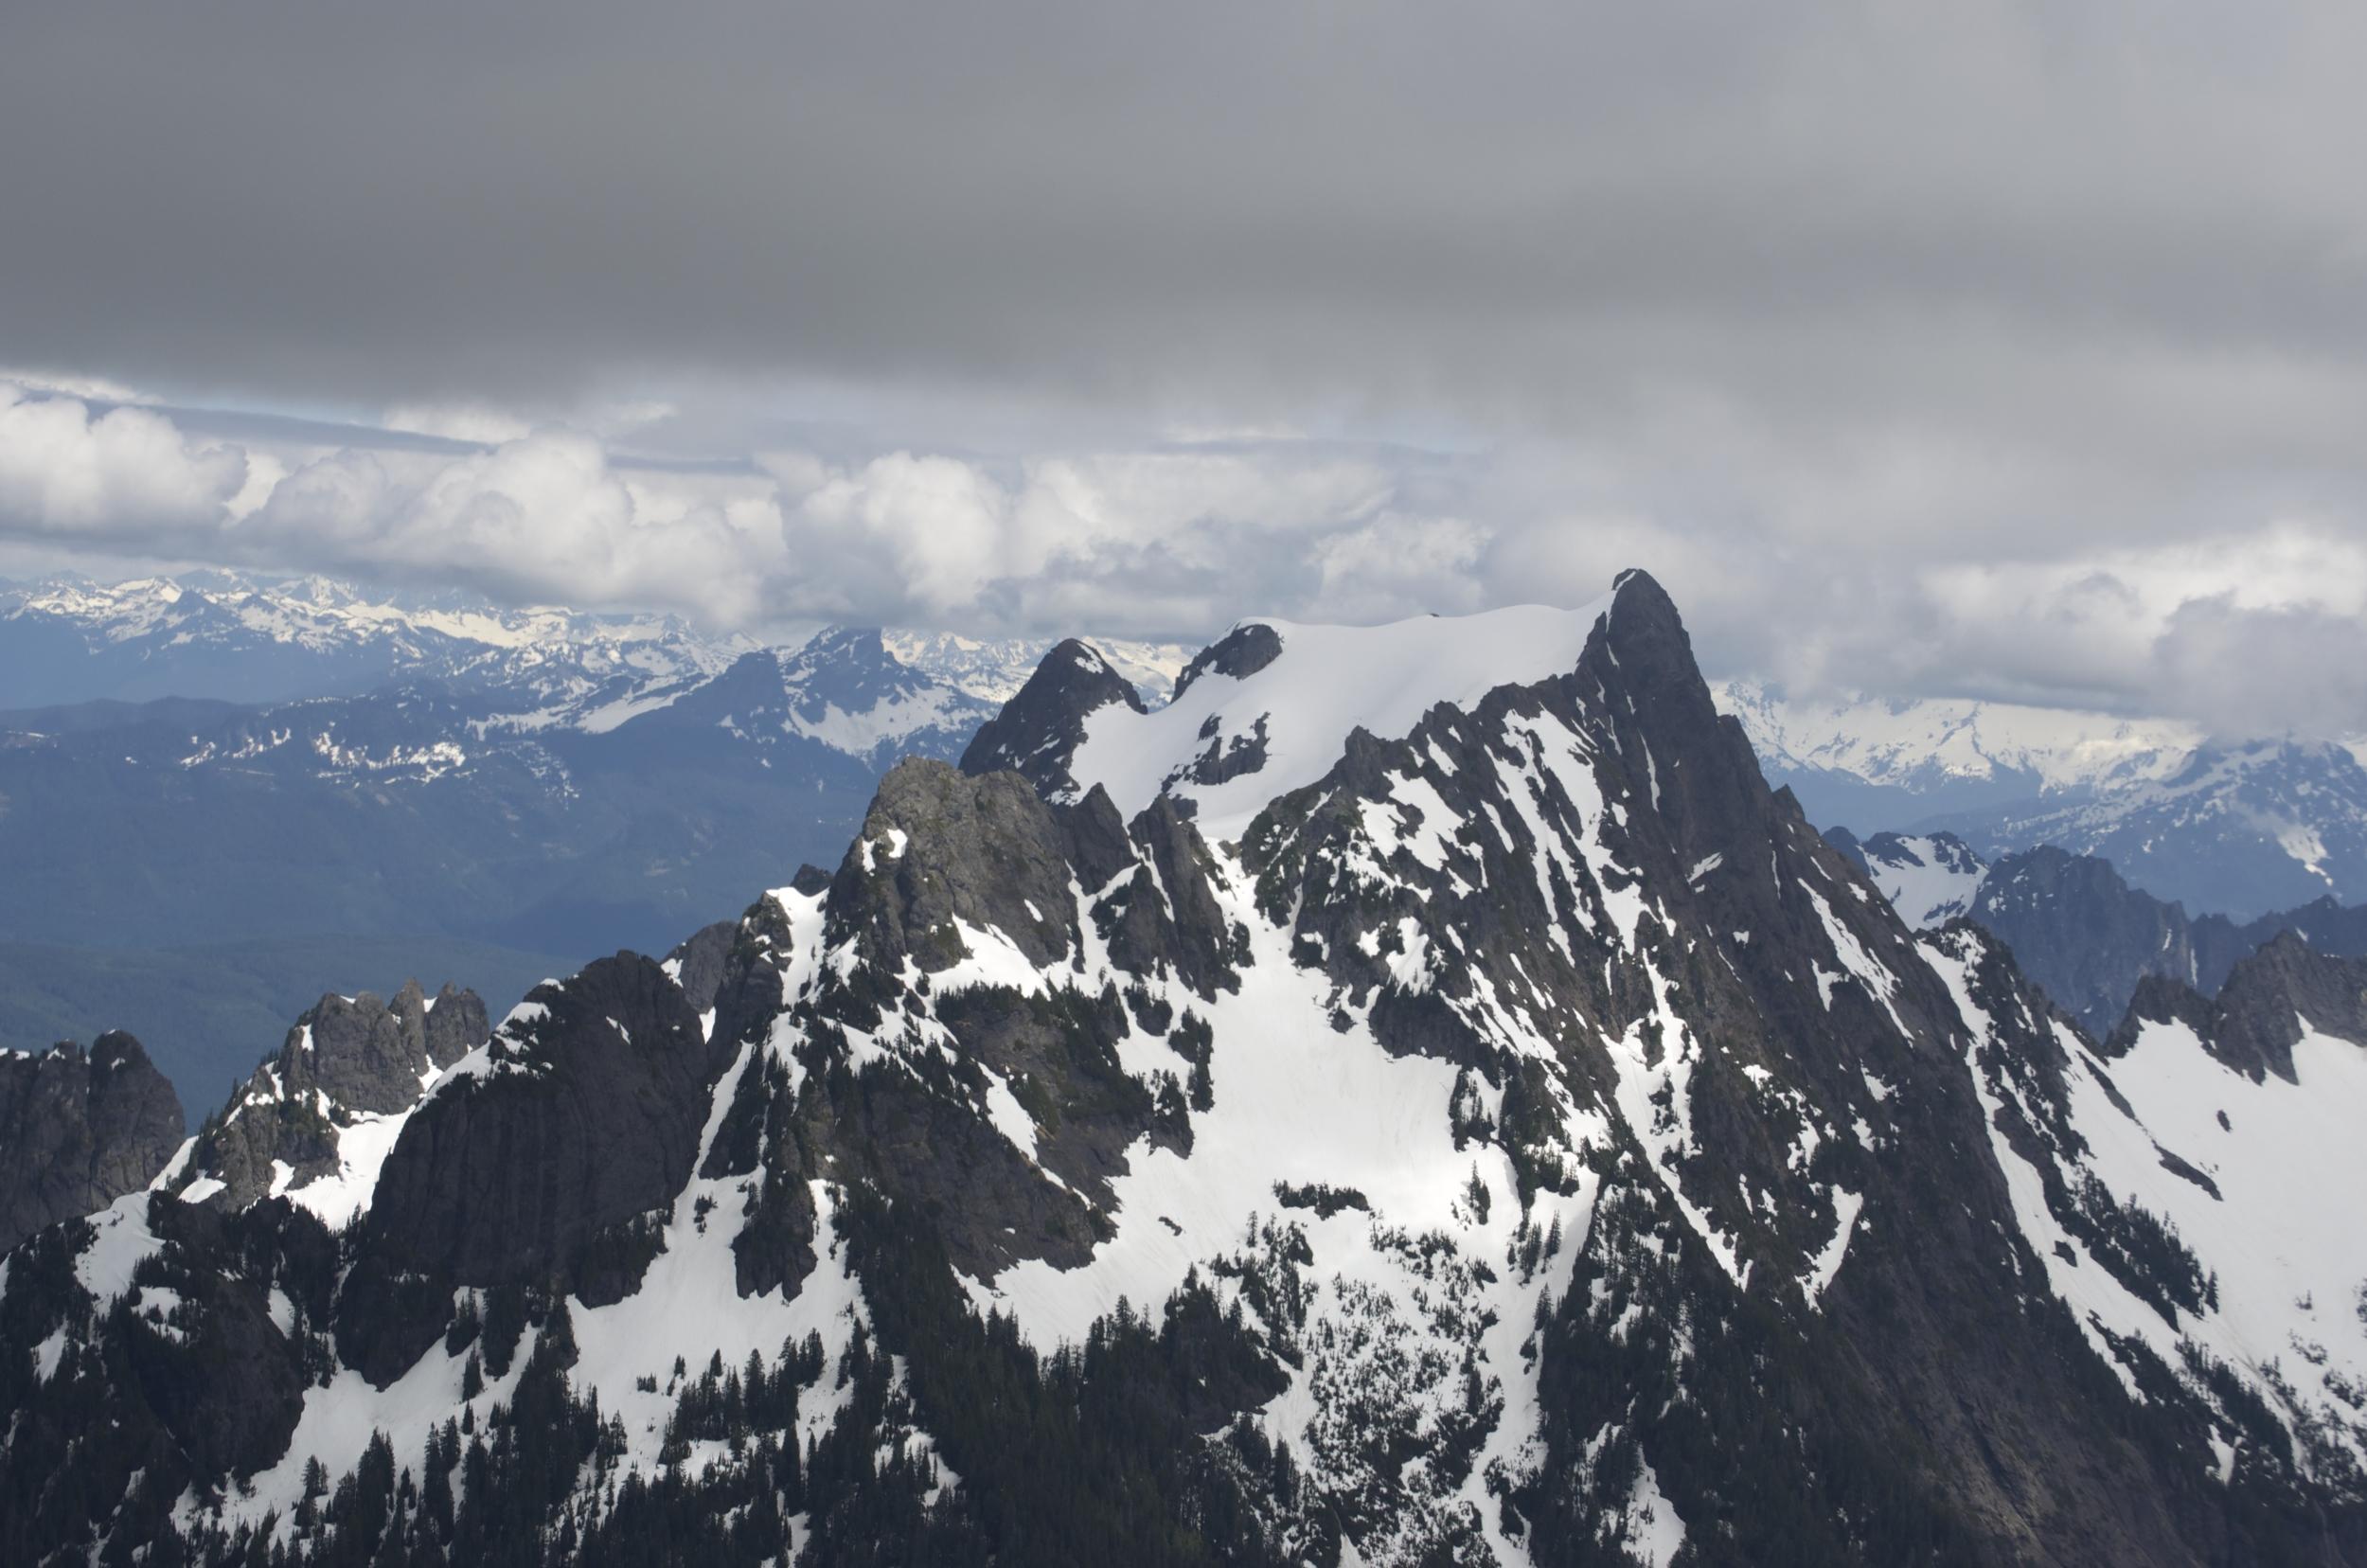 Mt. Pilchuck from Grumpy